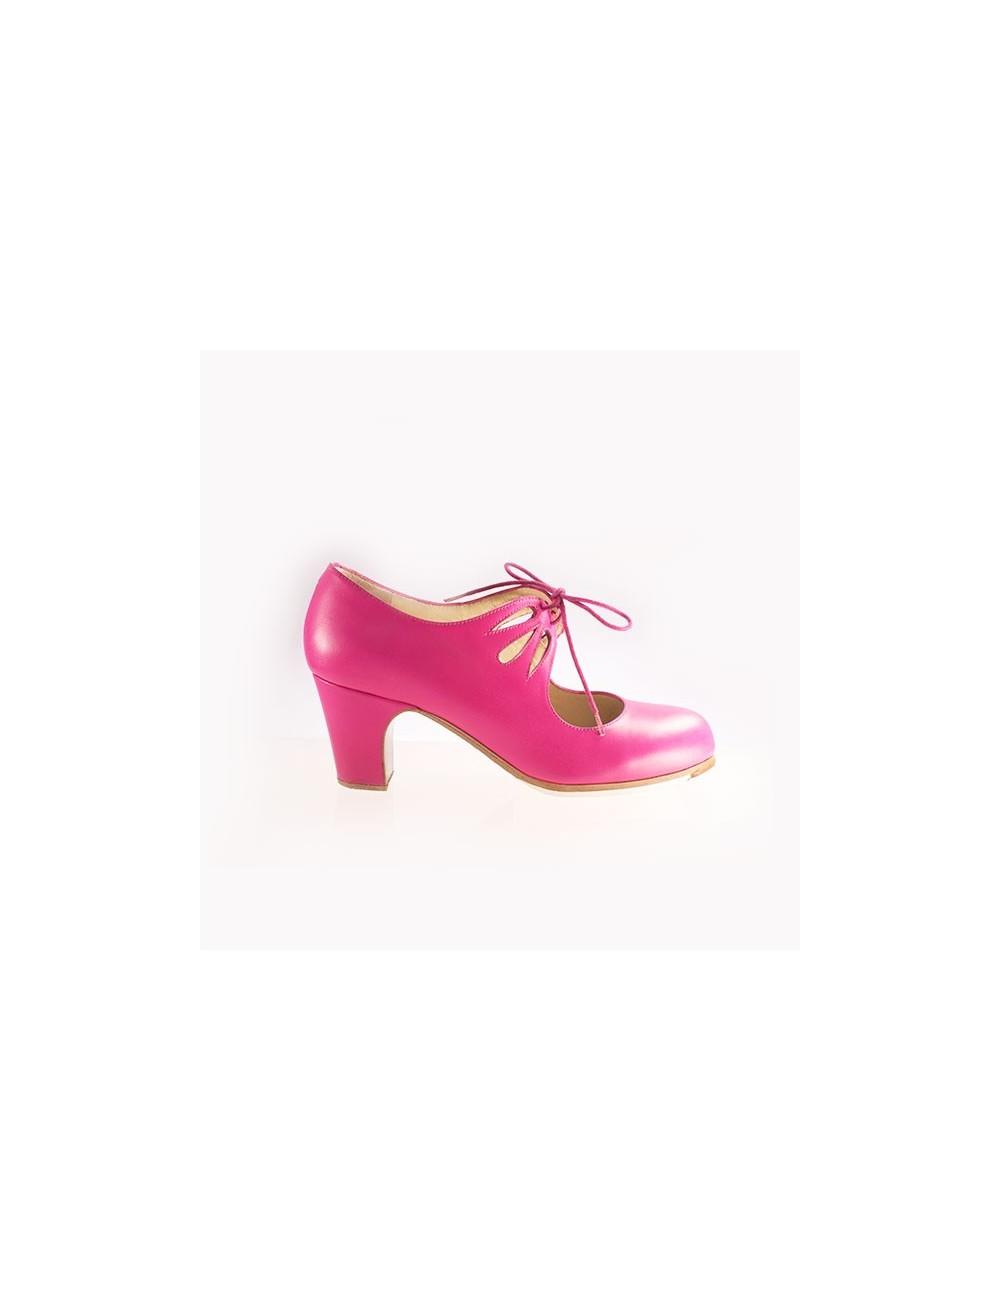 Chaussures de flamenco Begona Cordonera Collado M54